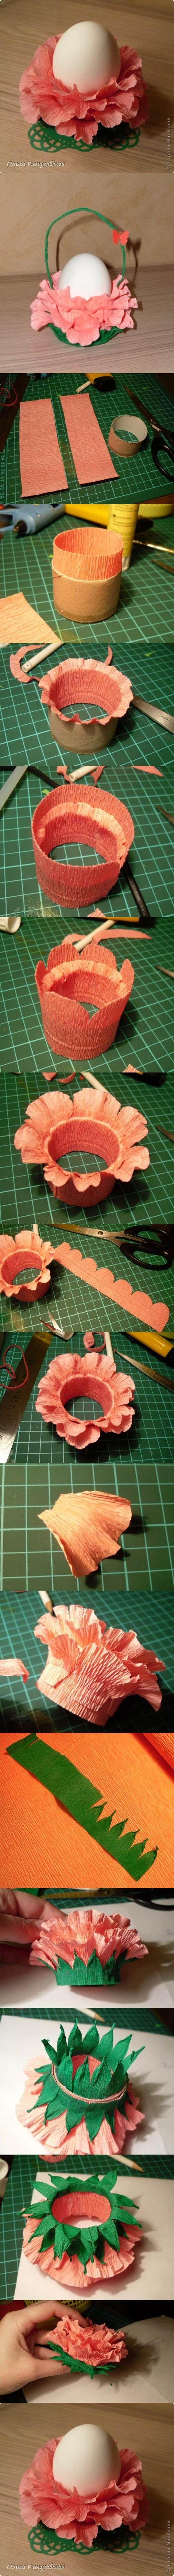 DIY Crepe Paper Flower Easter Egg Stand | iCreativeIdeas.com Like Us on Facebook ==> https://www.facebook.com/icreativeideas